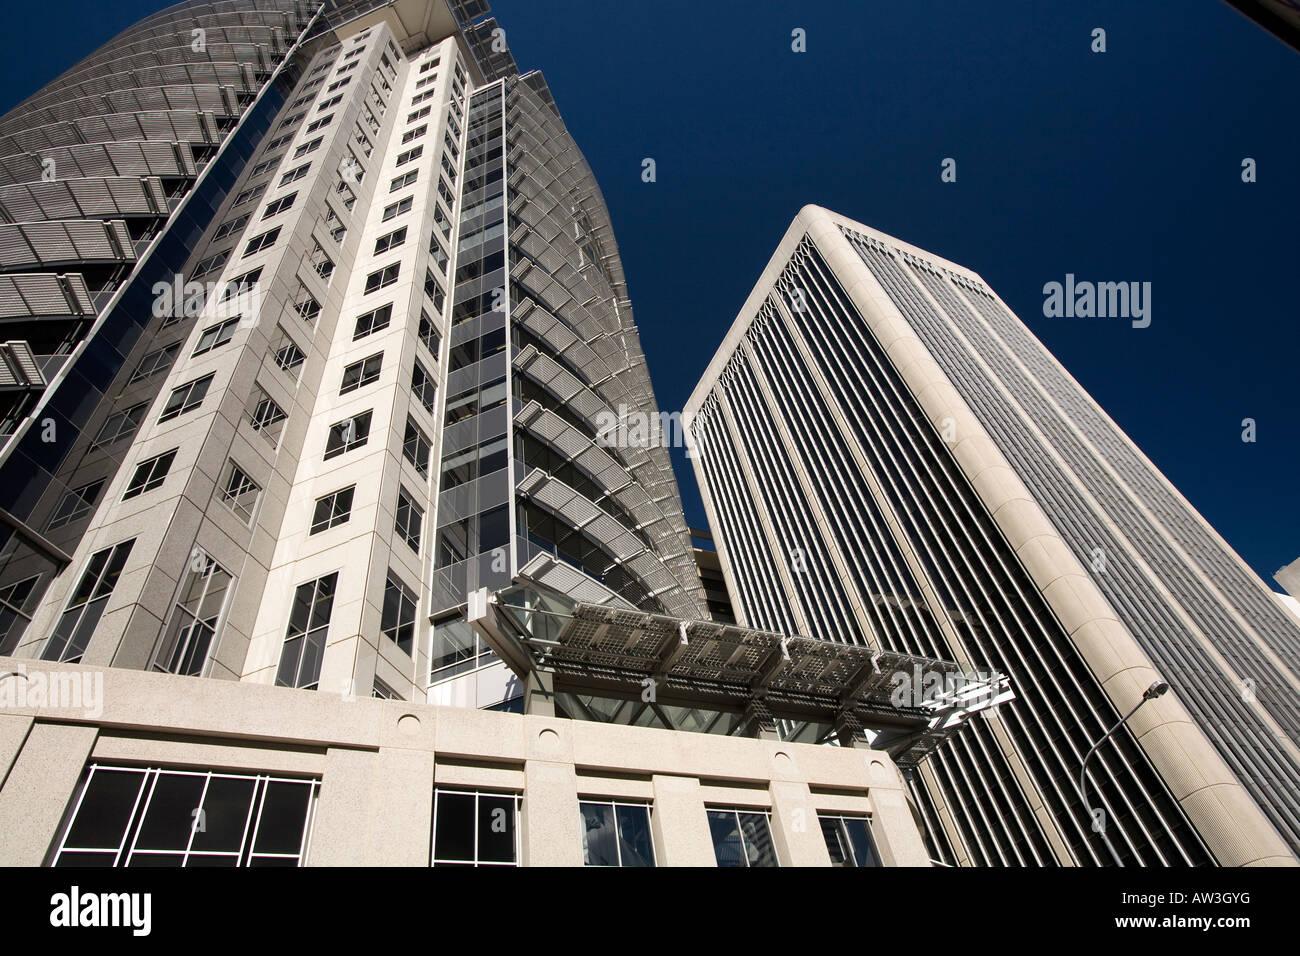 residential apartment high rise building on edward street,brisbane,australia - Stock Image